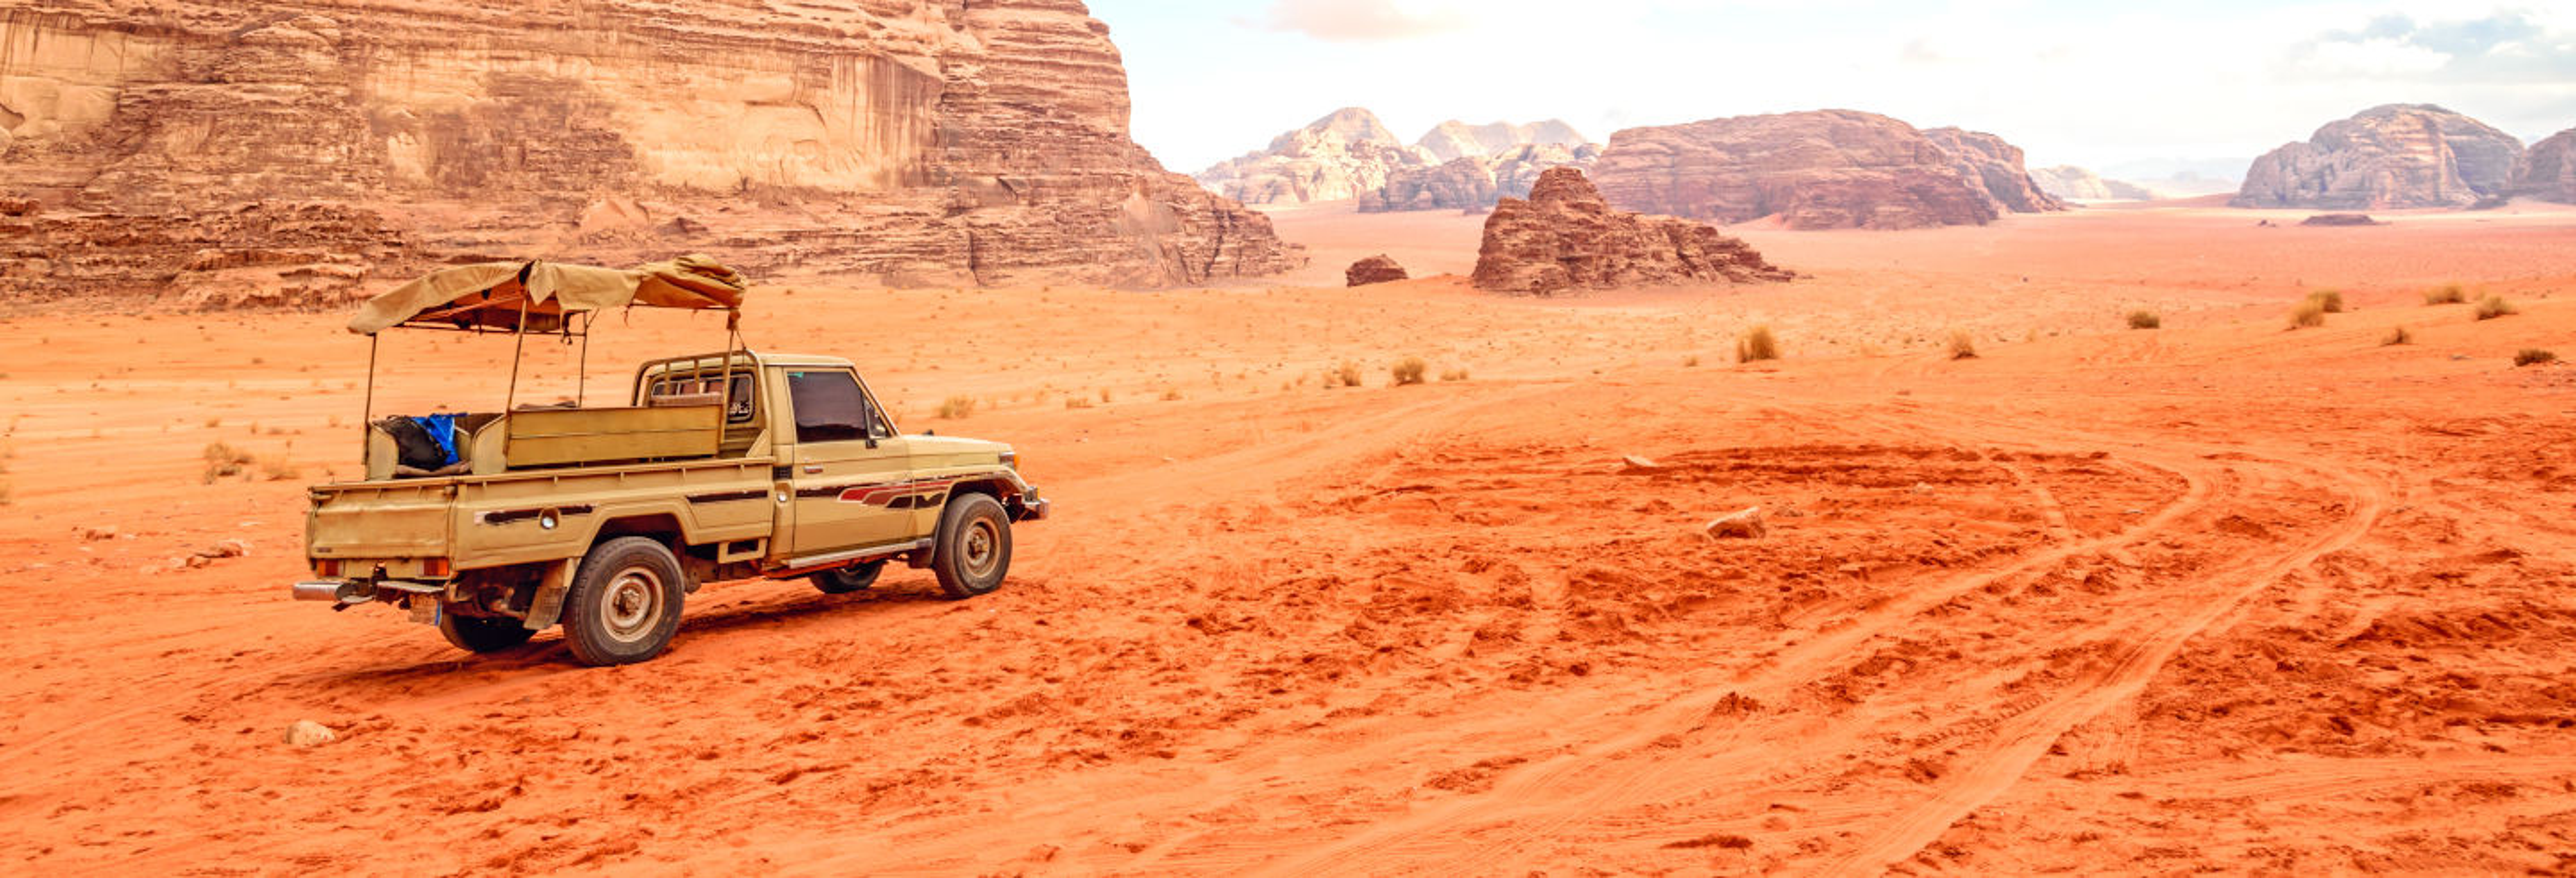 Tour por Áqaba + Jeep por Wadi Rum